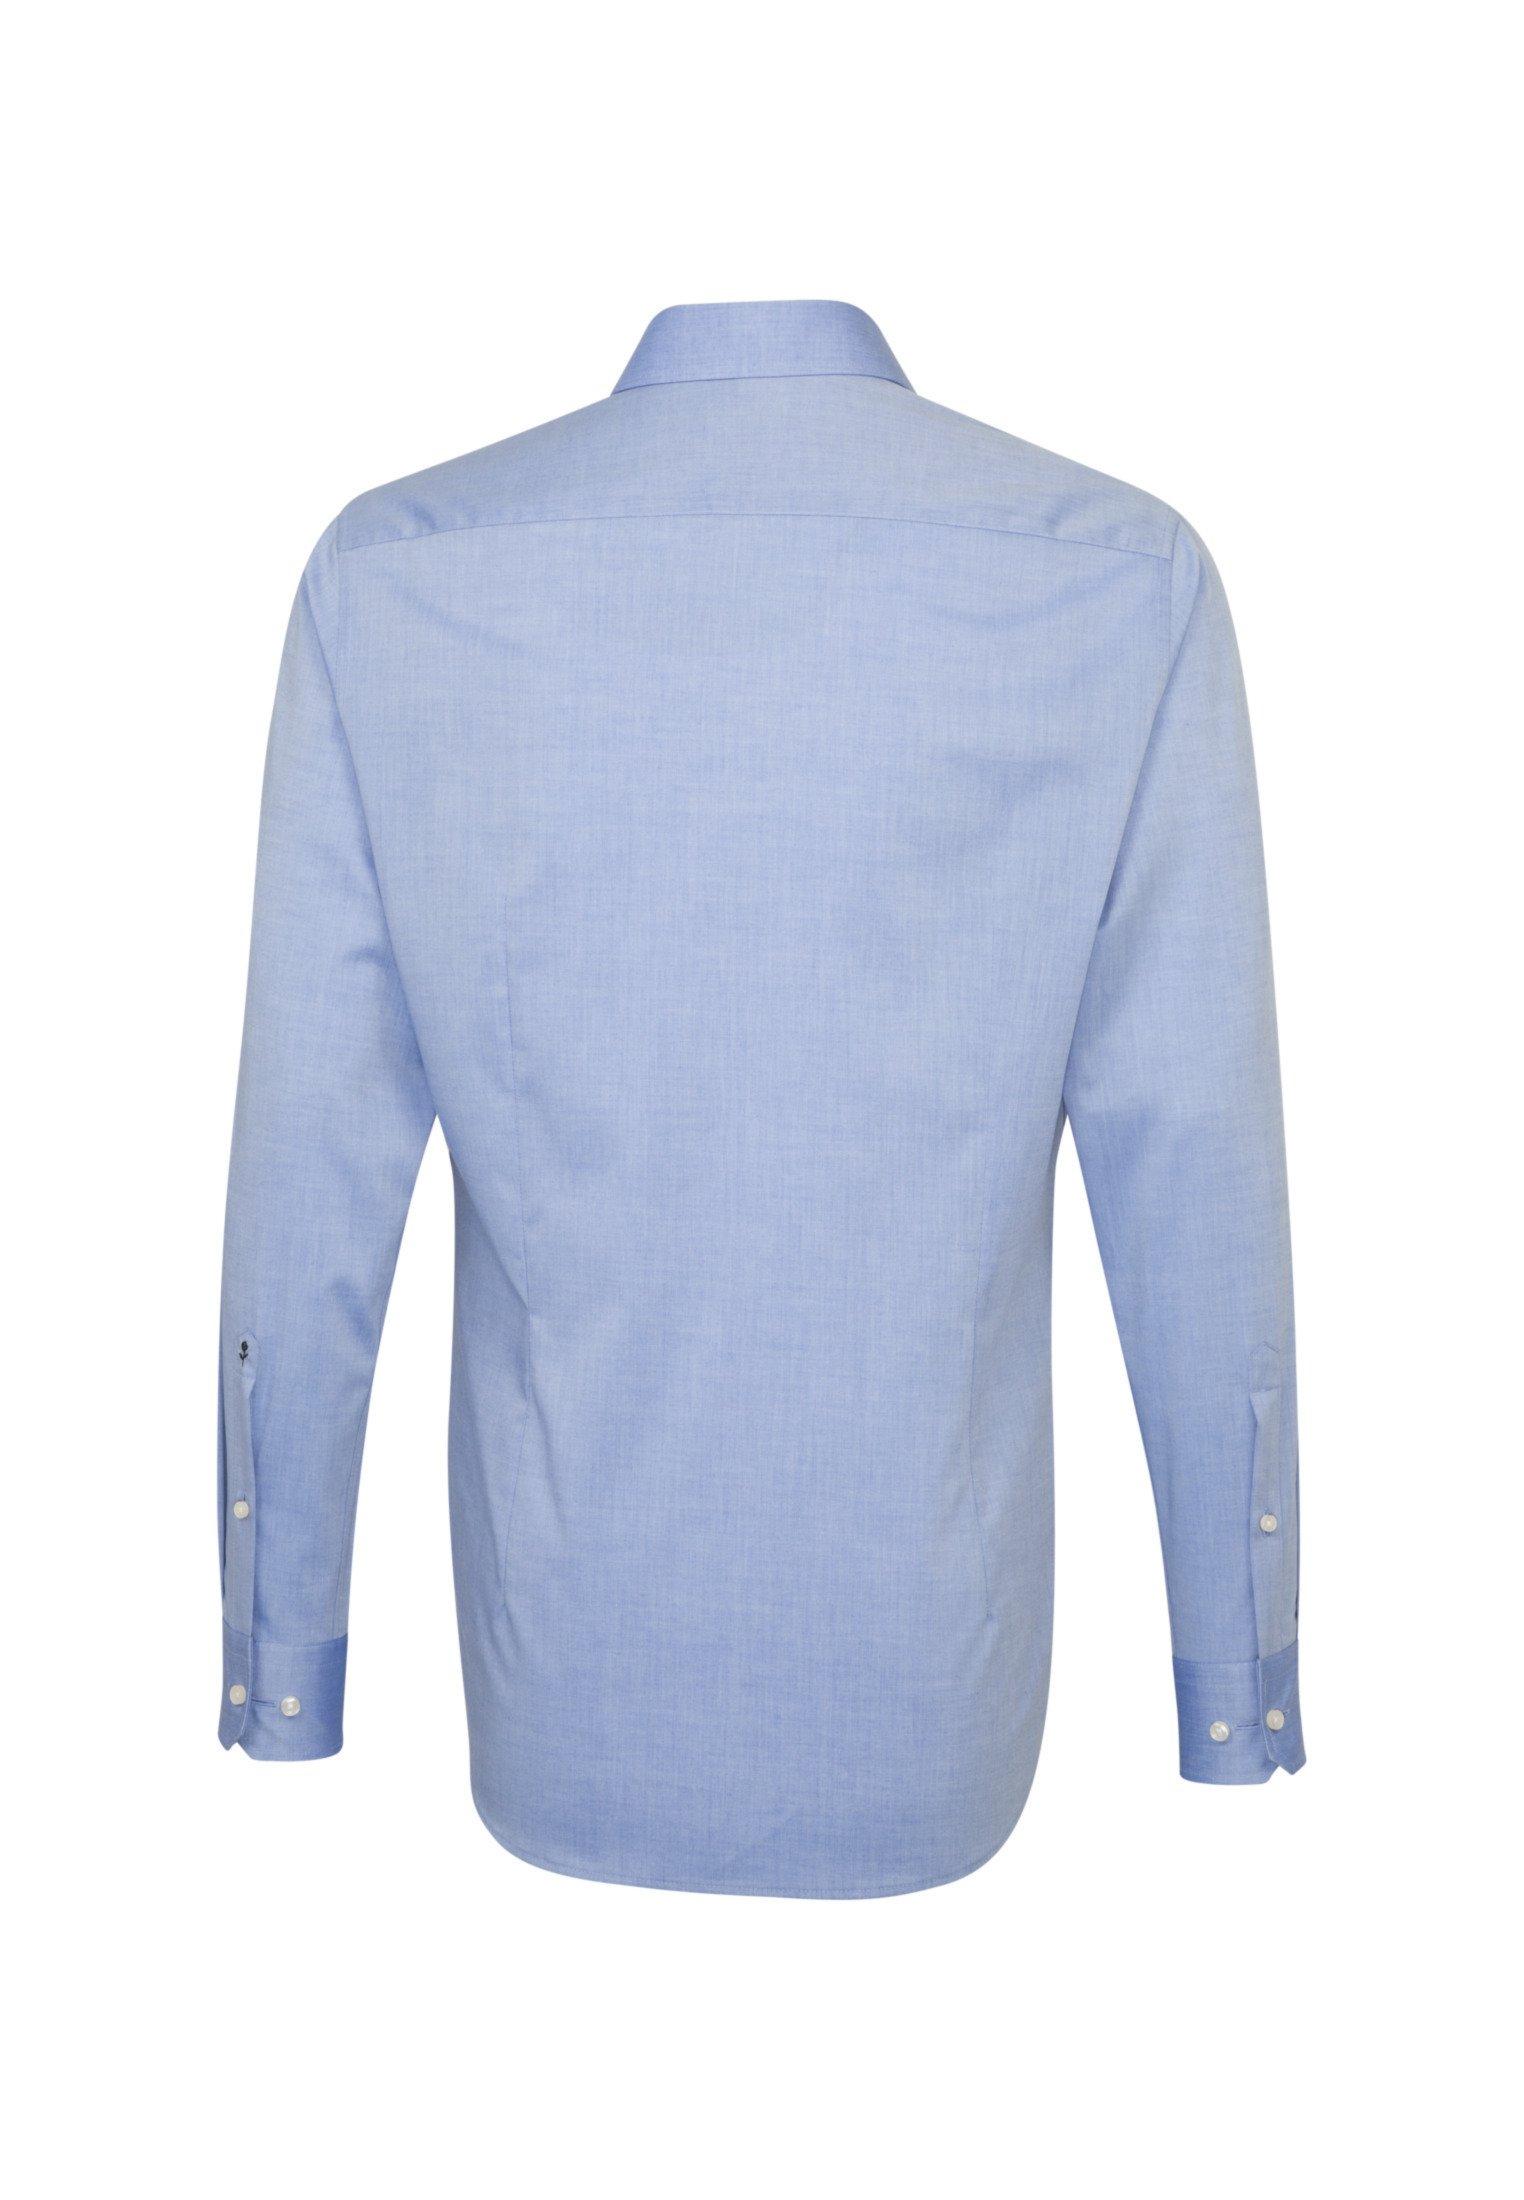 Seidensticker TAILORED FIT - Chemise - blau